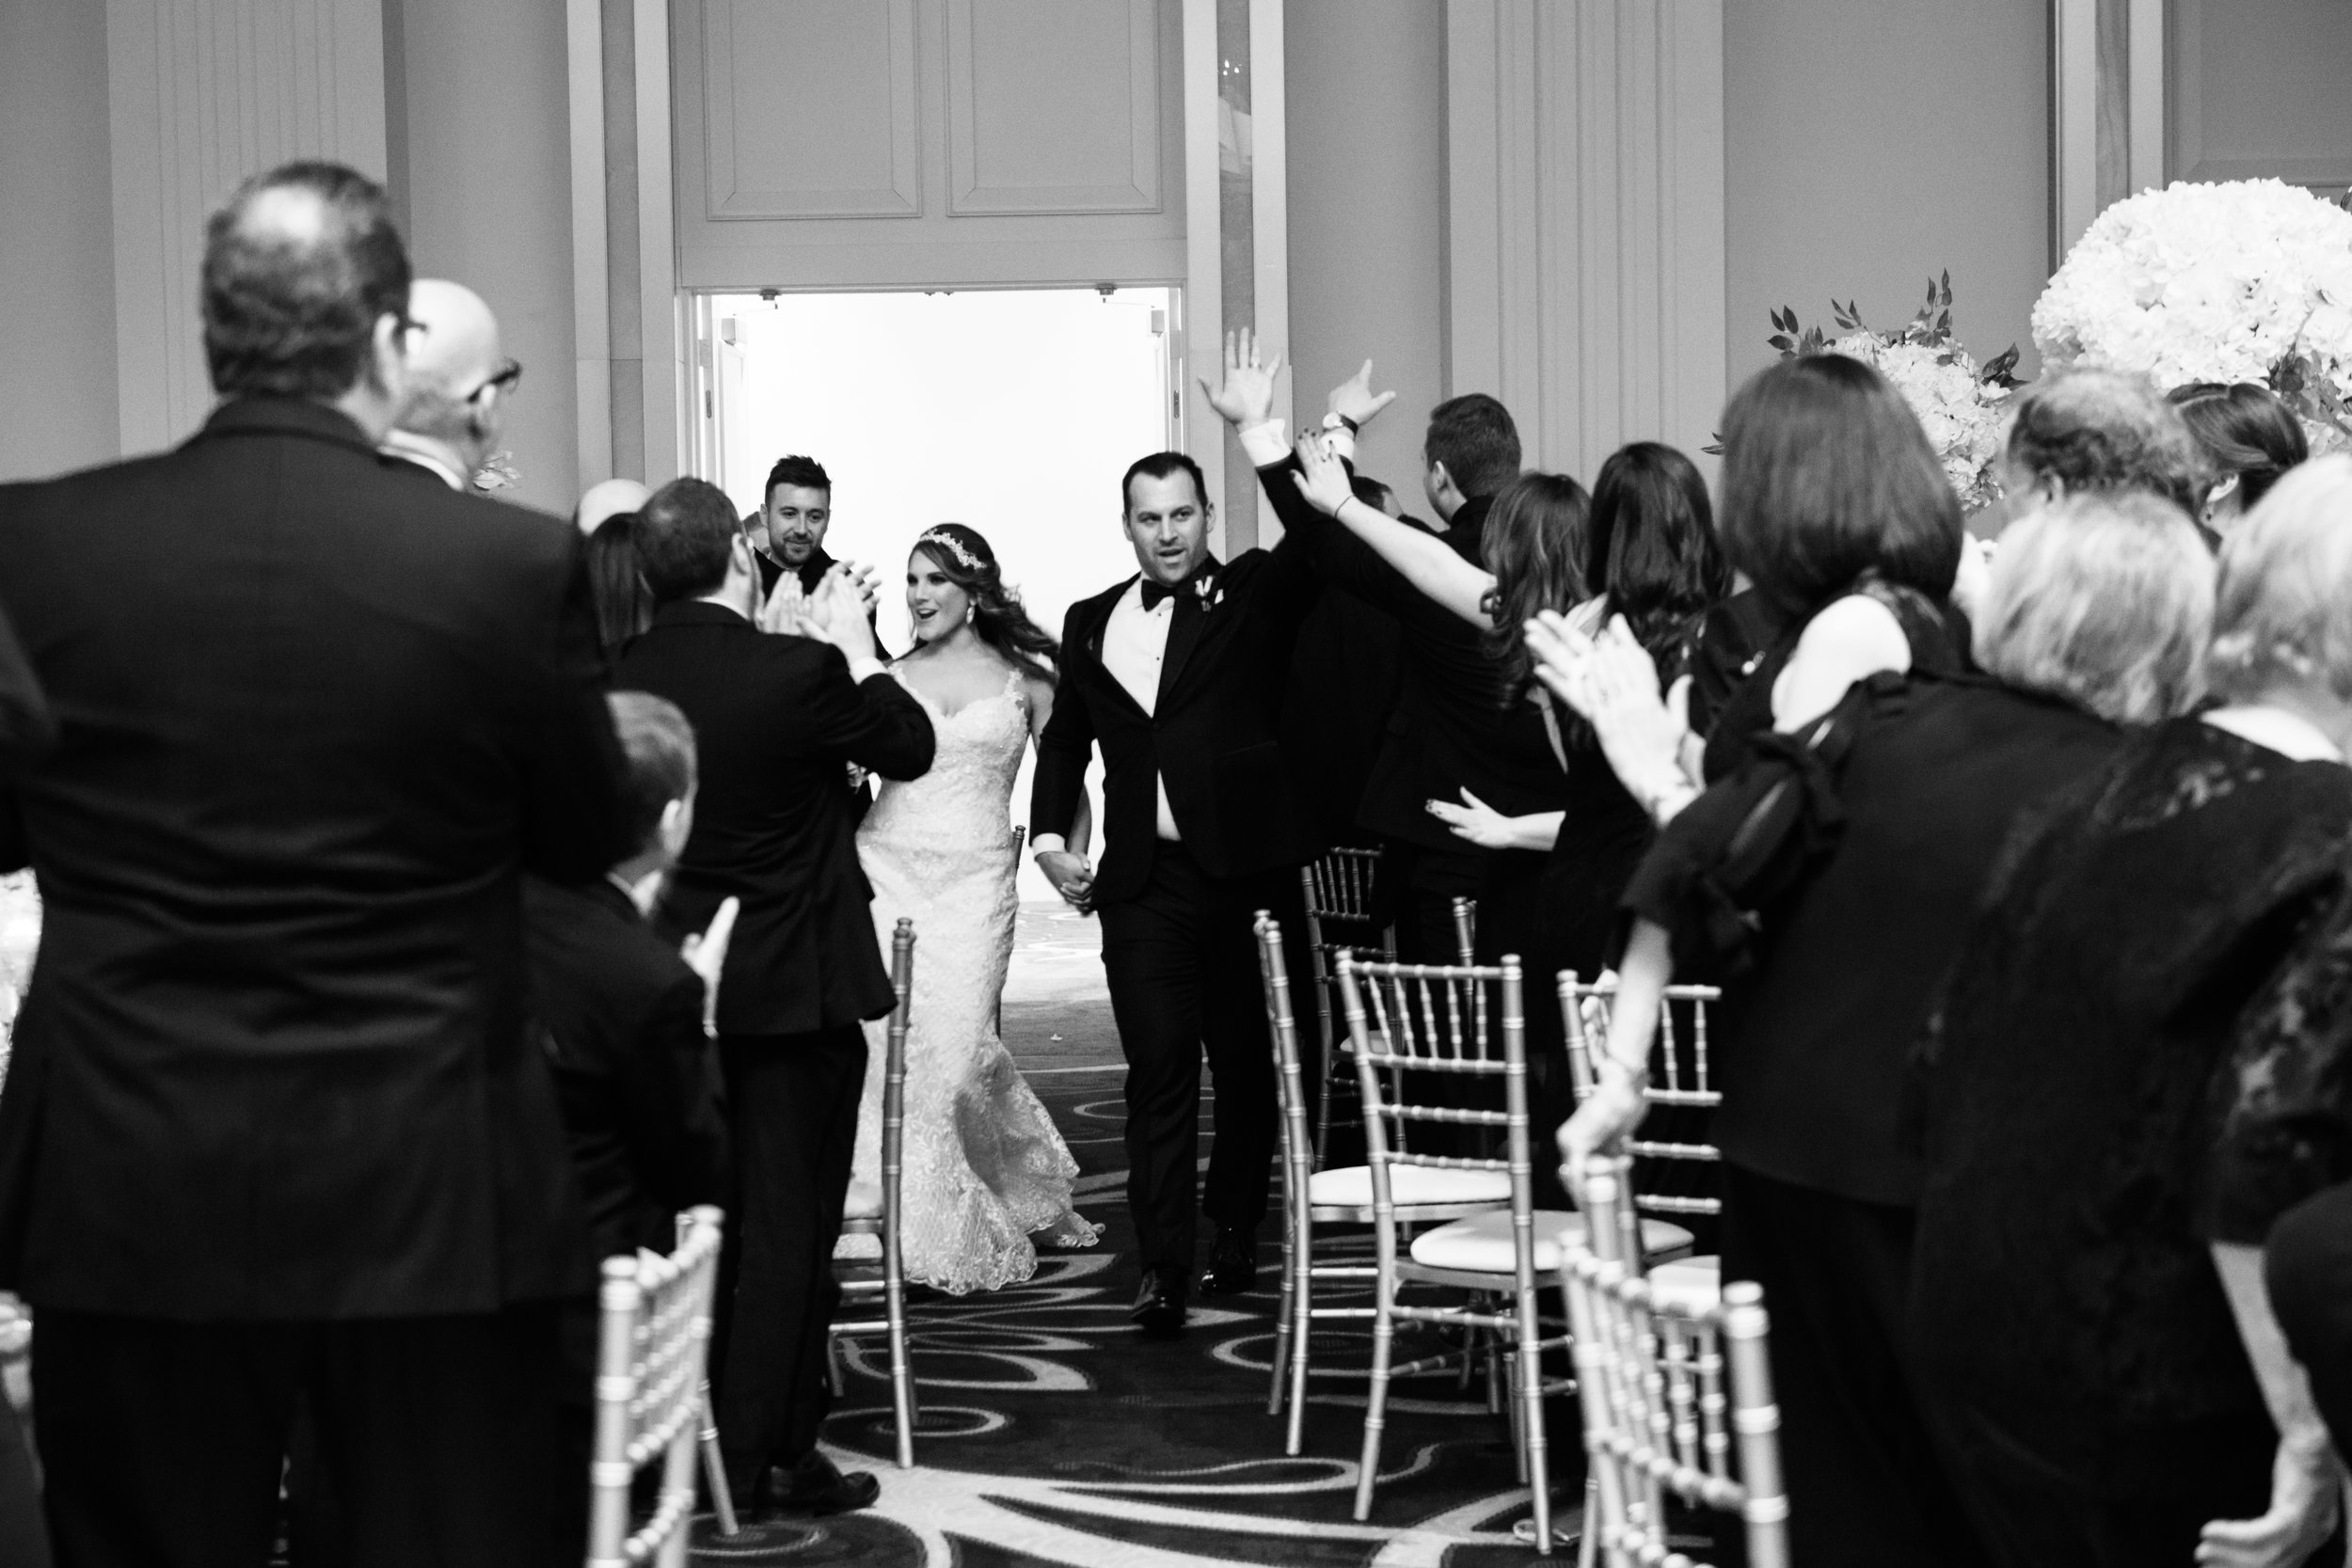 Elegant wedding at the JW Marriott Chicago26.jpg